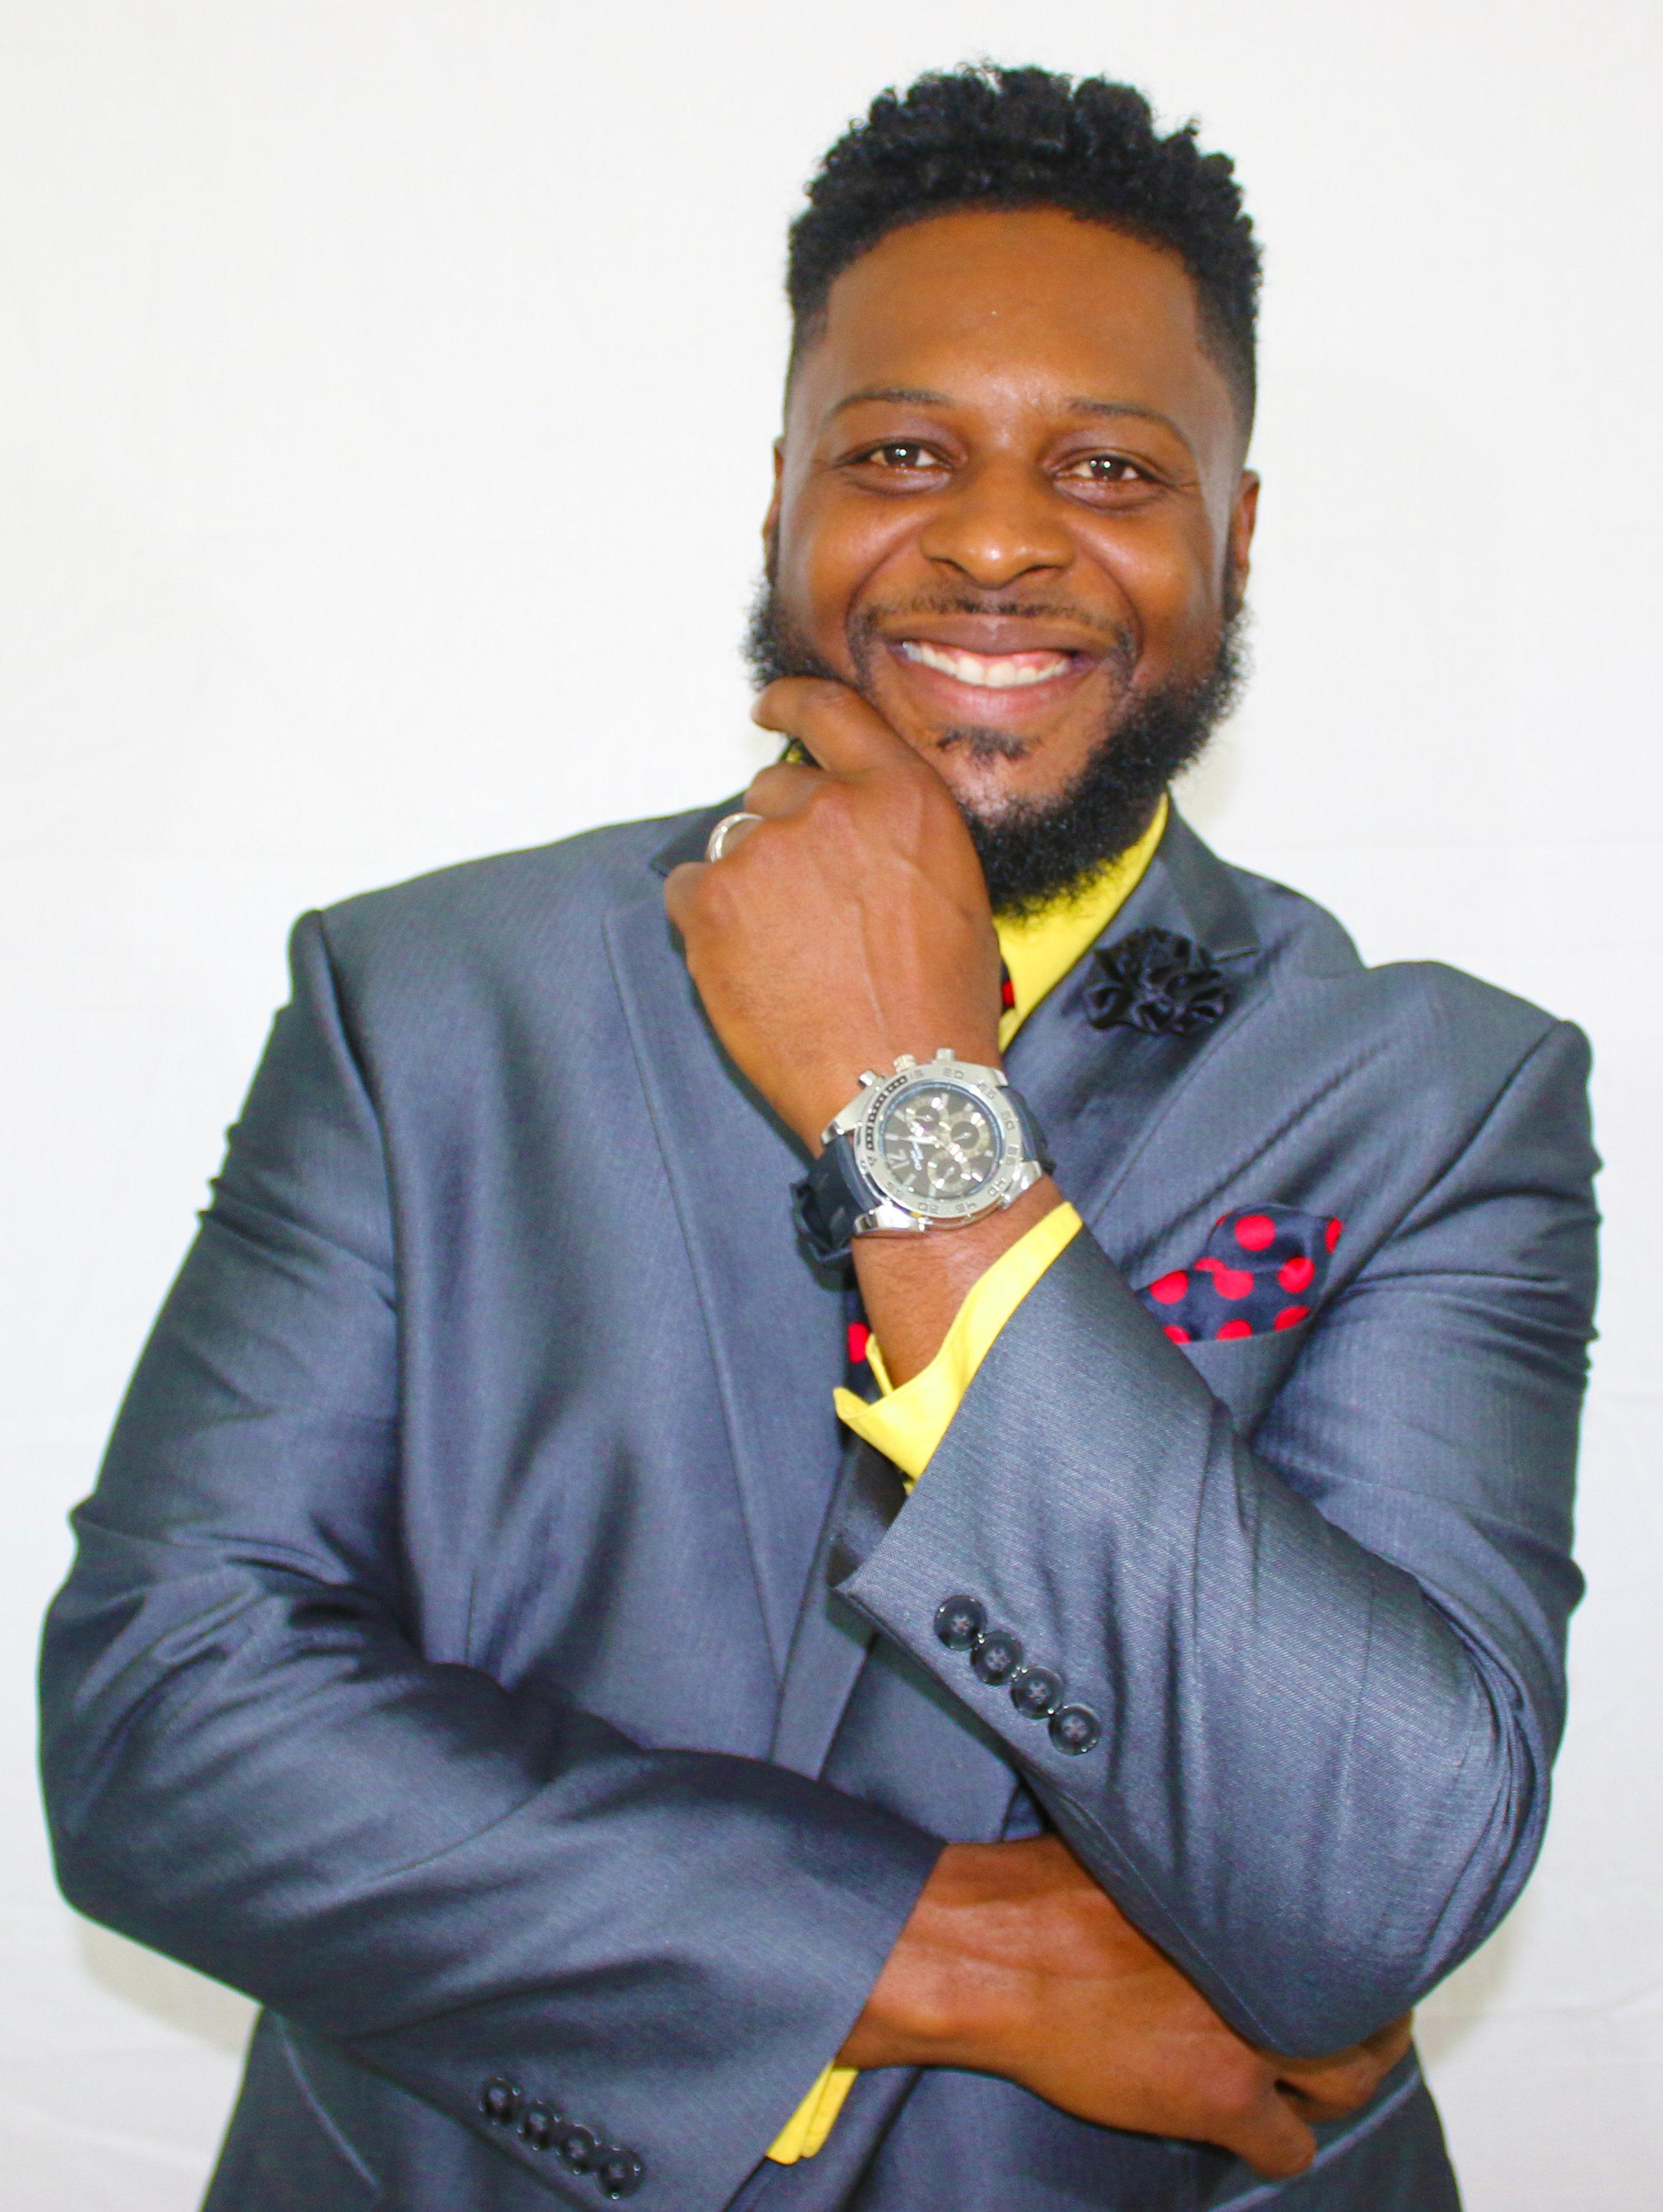 Pastor-Elect Aaron White